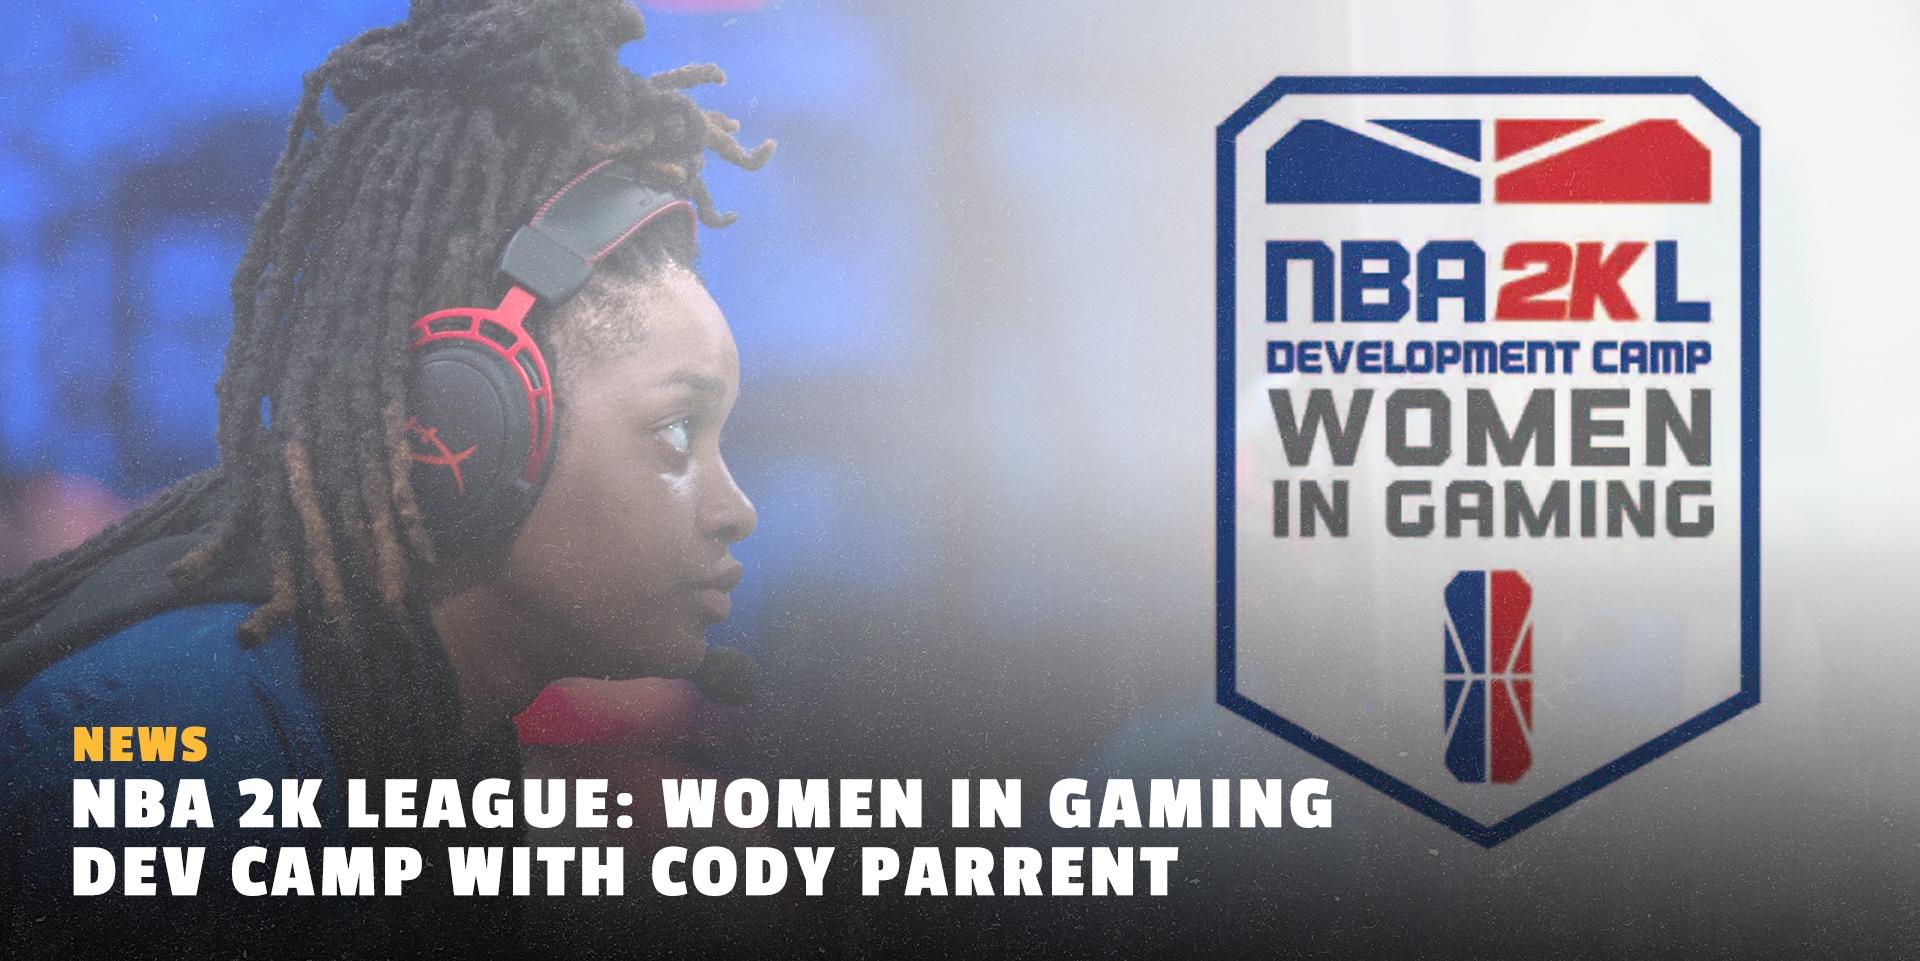 The NBA 2K League Development  Camp: Women in Gaming